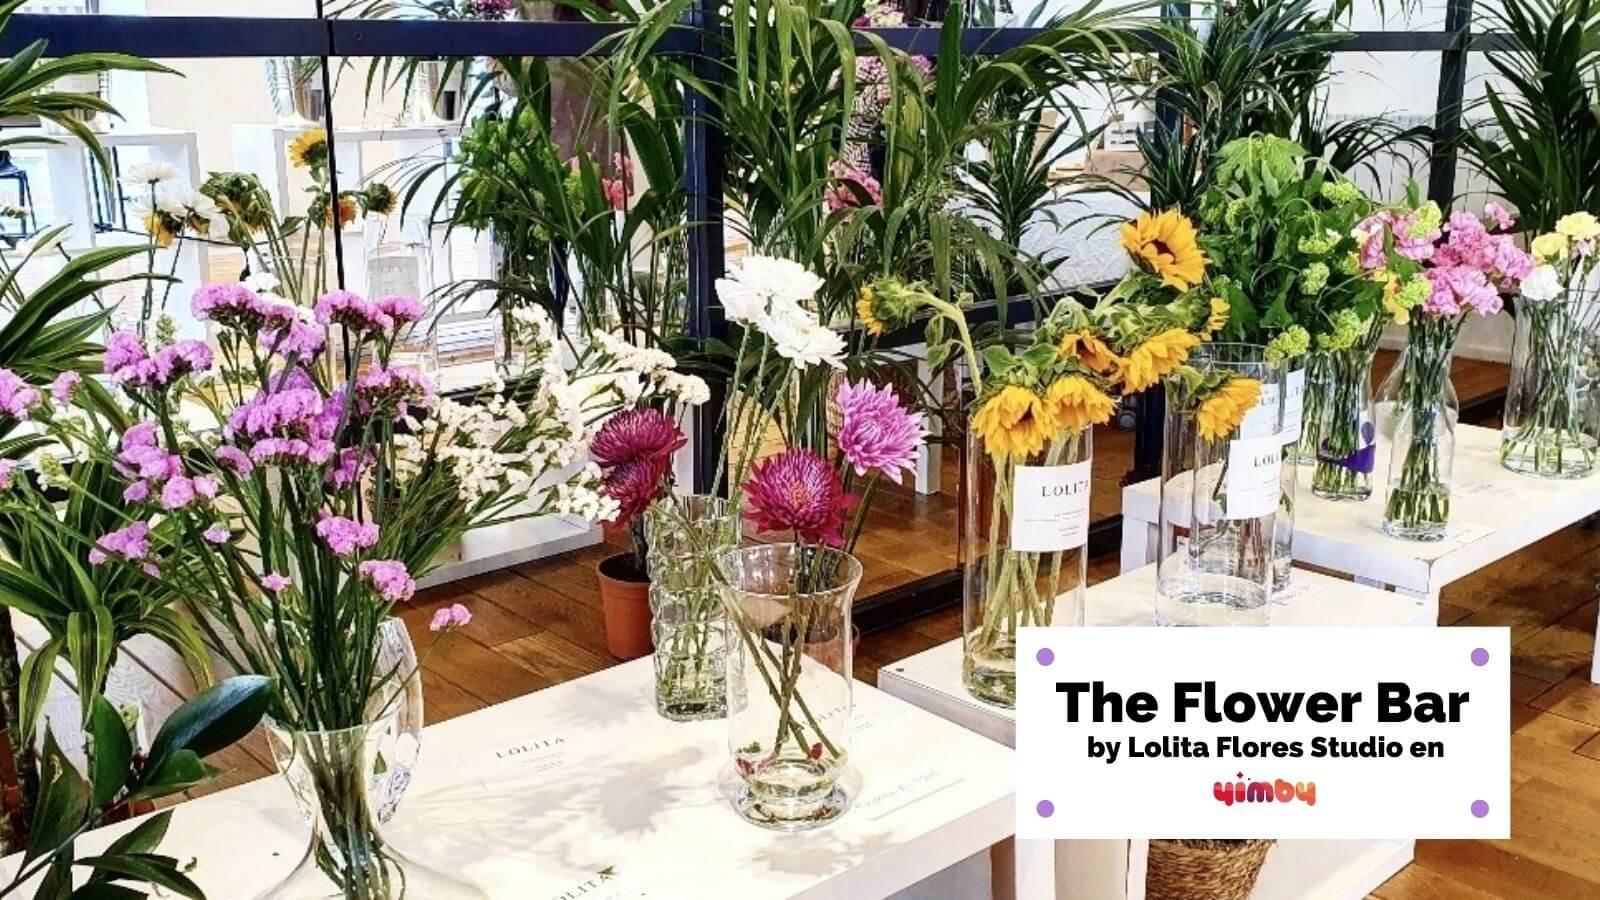 The Flower Bar - Lolita Flores Studio